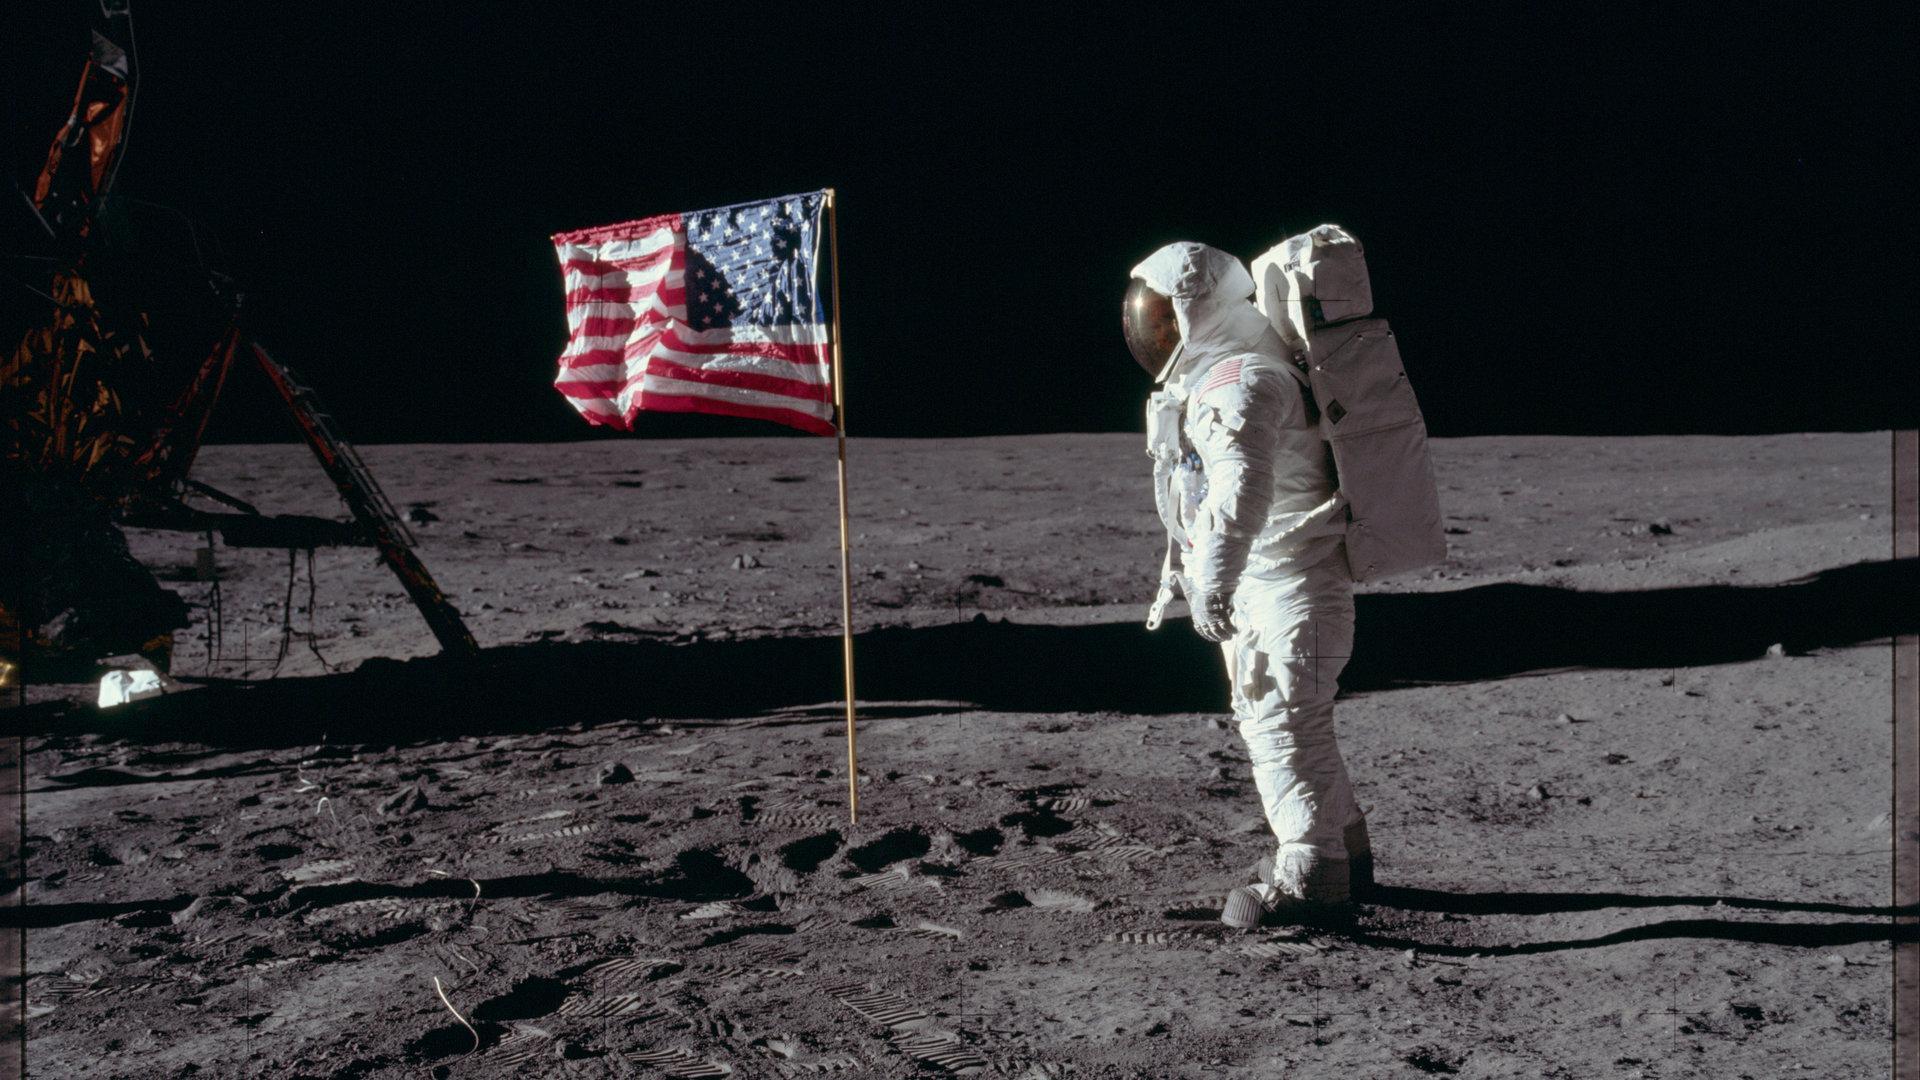 NASA-Projekt zur Mondlandung gestoppt: Wissenschafter schockiert